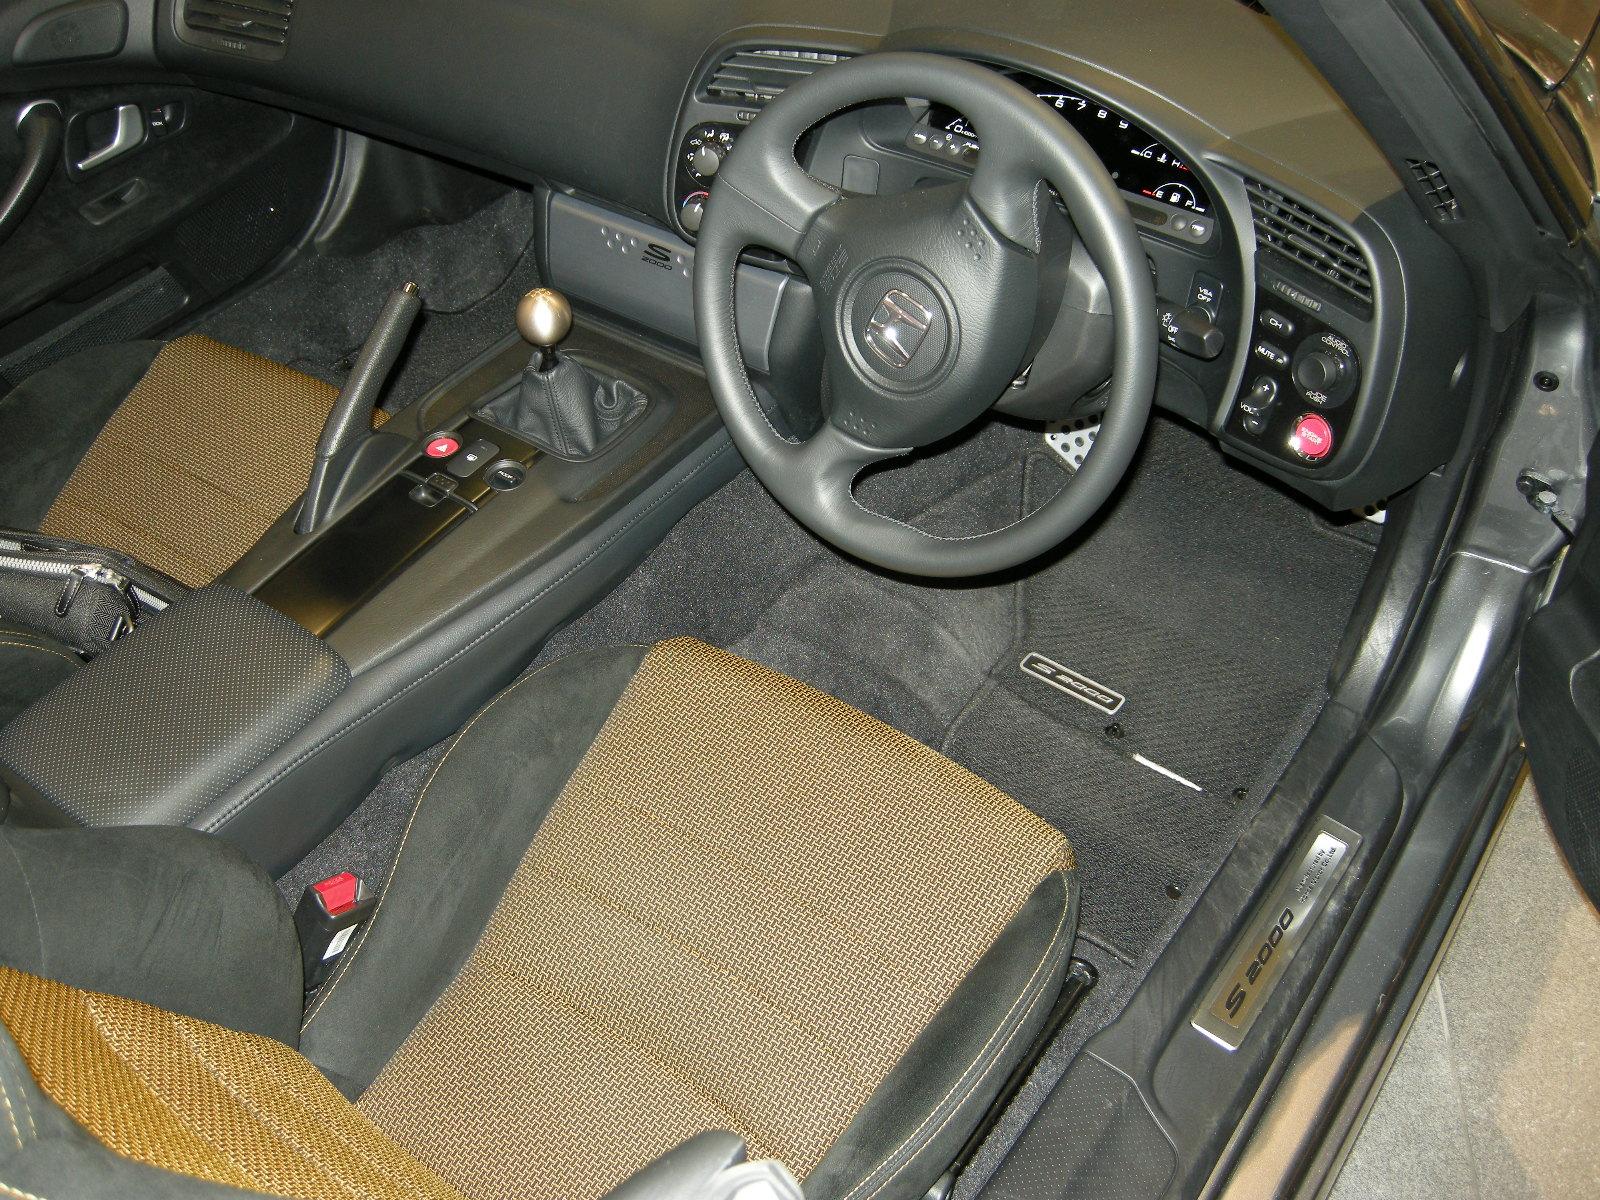 File:2007 Honda S2000 TypeS Interior.JPG - Wikimedia Commons